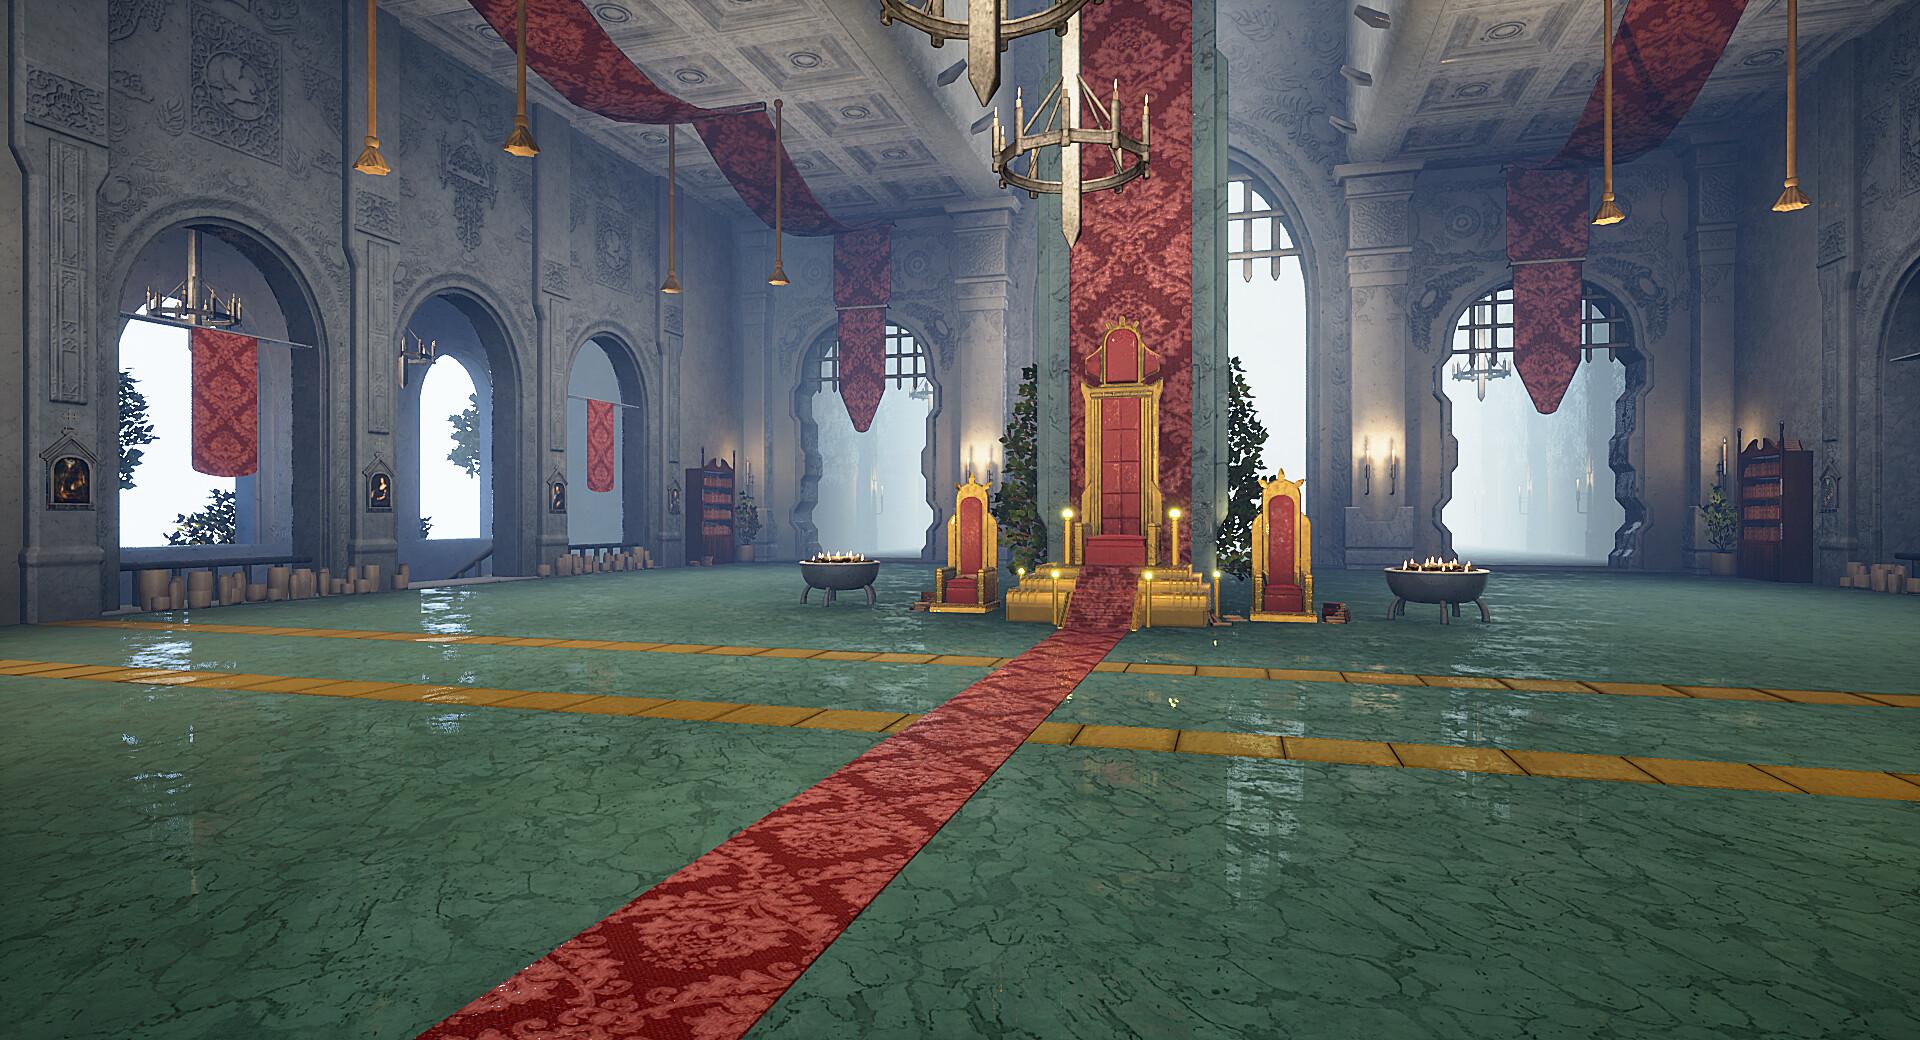 Axel loreman throneroomfullshot